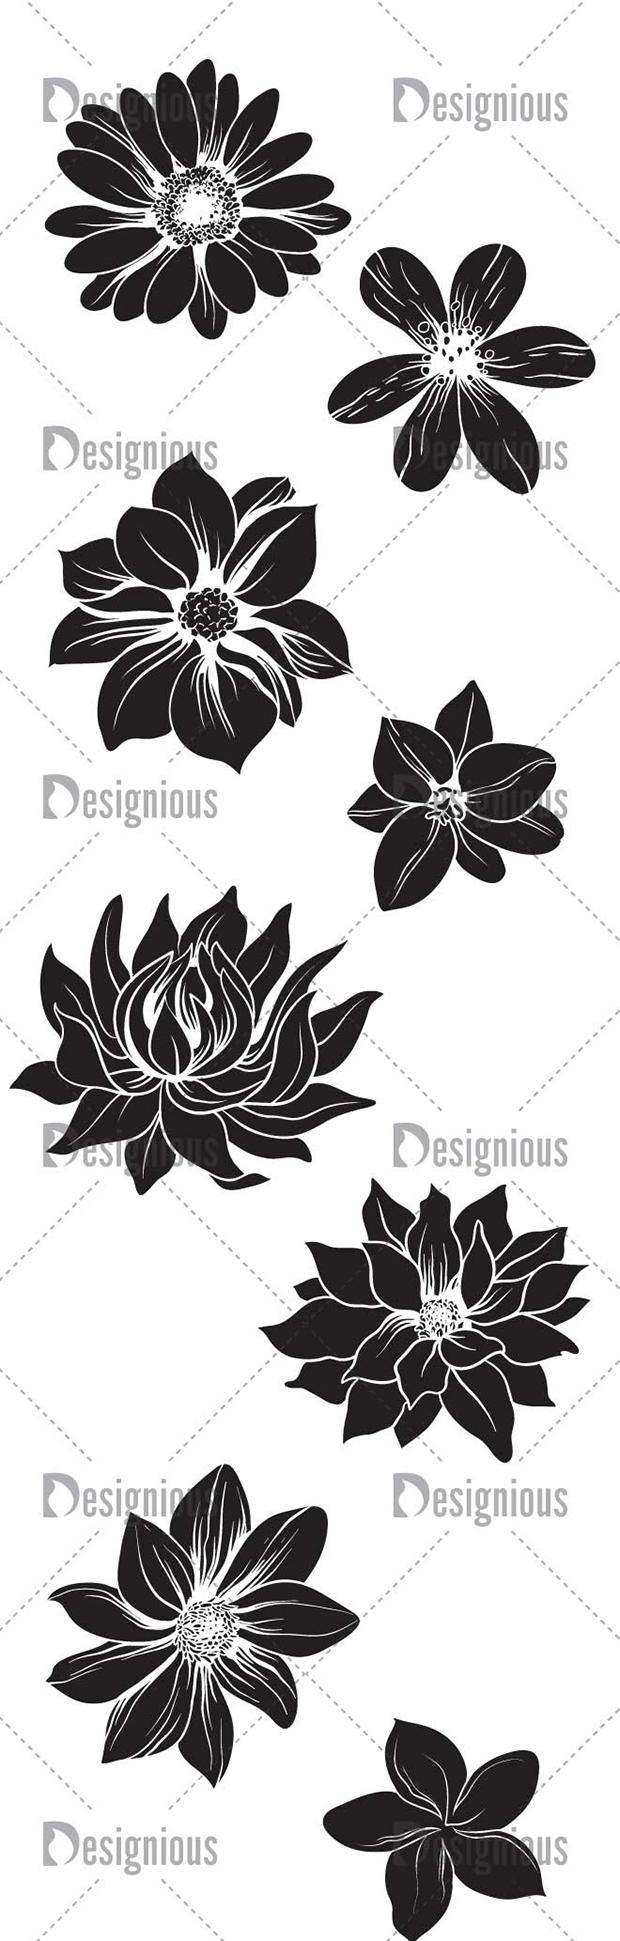 Vector Flowers Pack 1 6